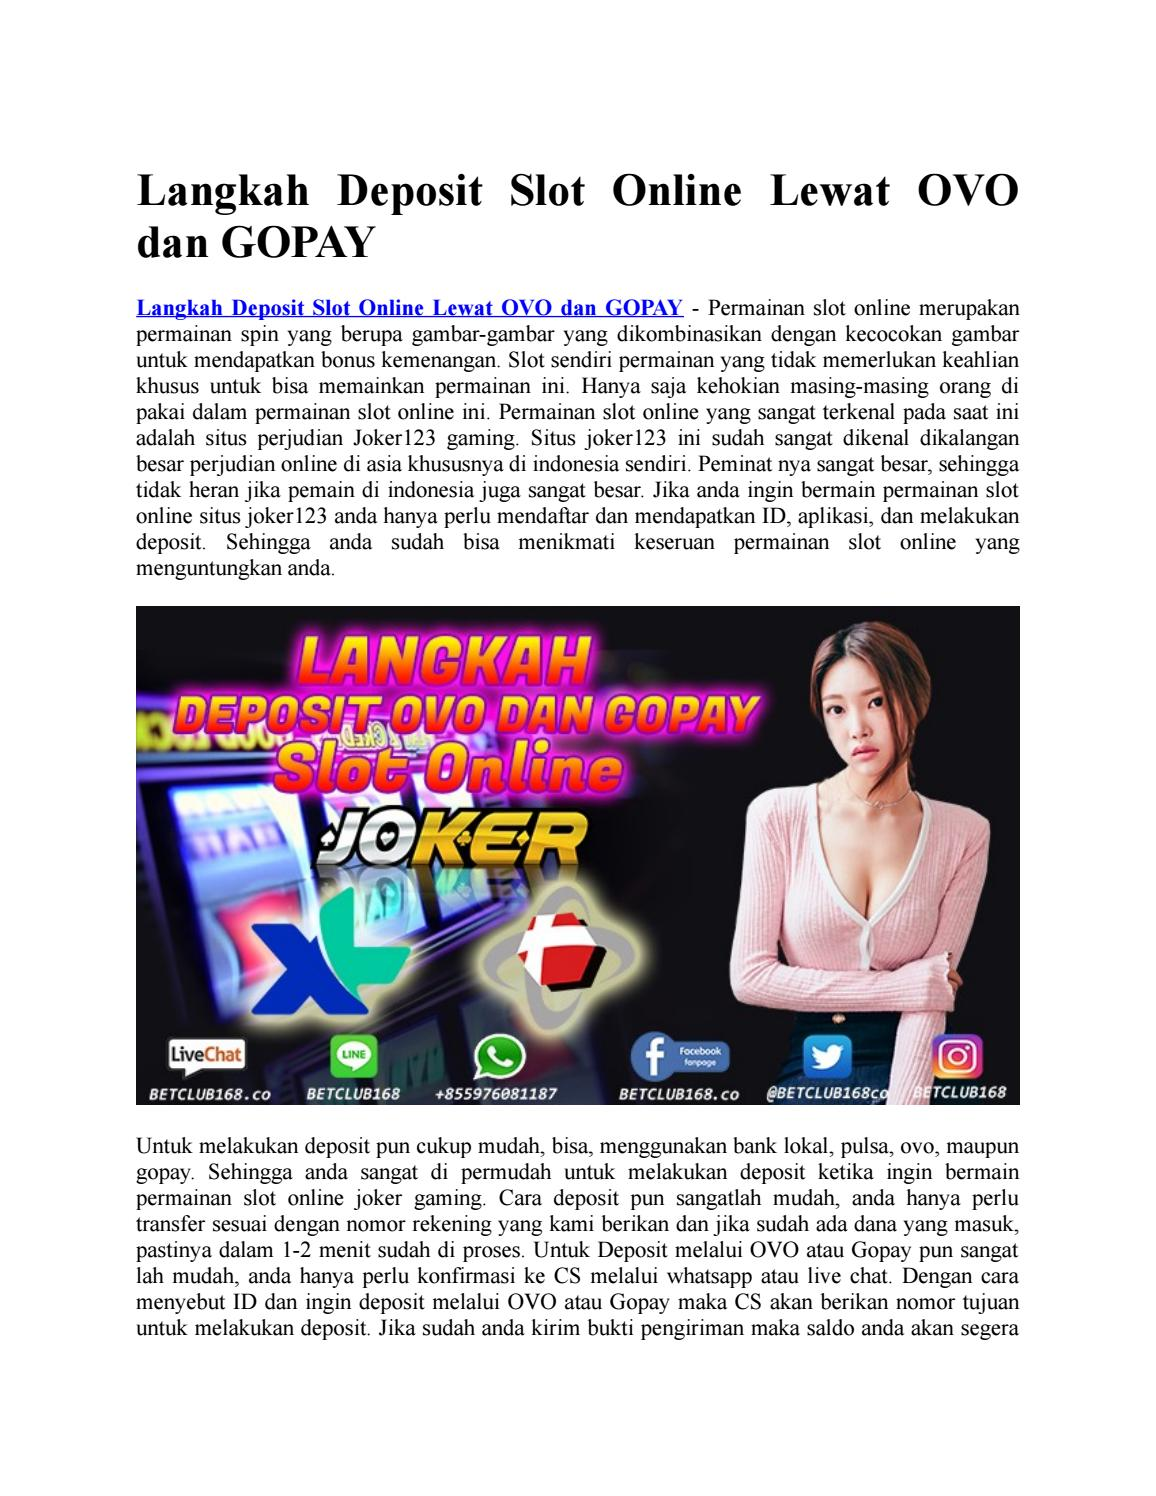 Langkah Deposit Slot Online Lewat Ovo Dan Gopay By Haruvani67465 Issuu